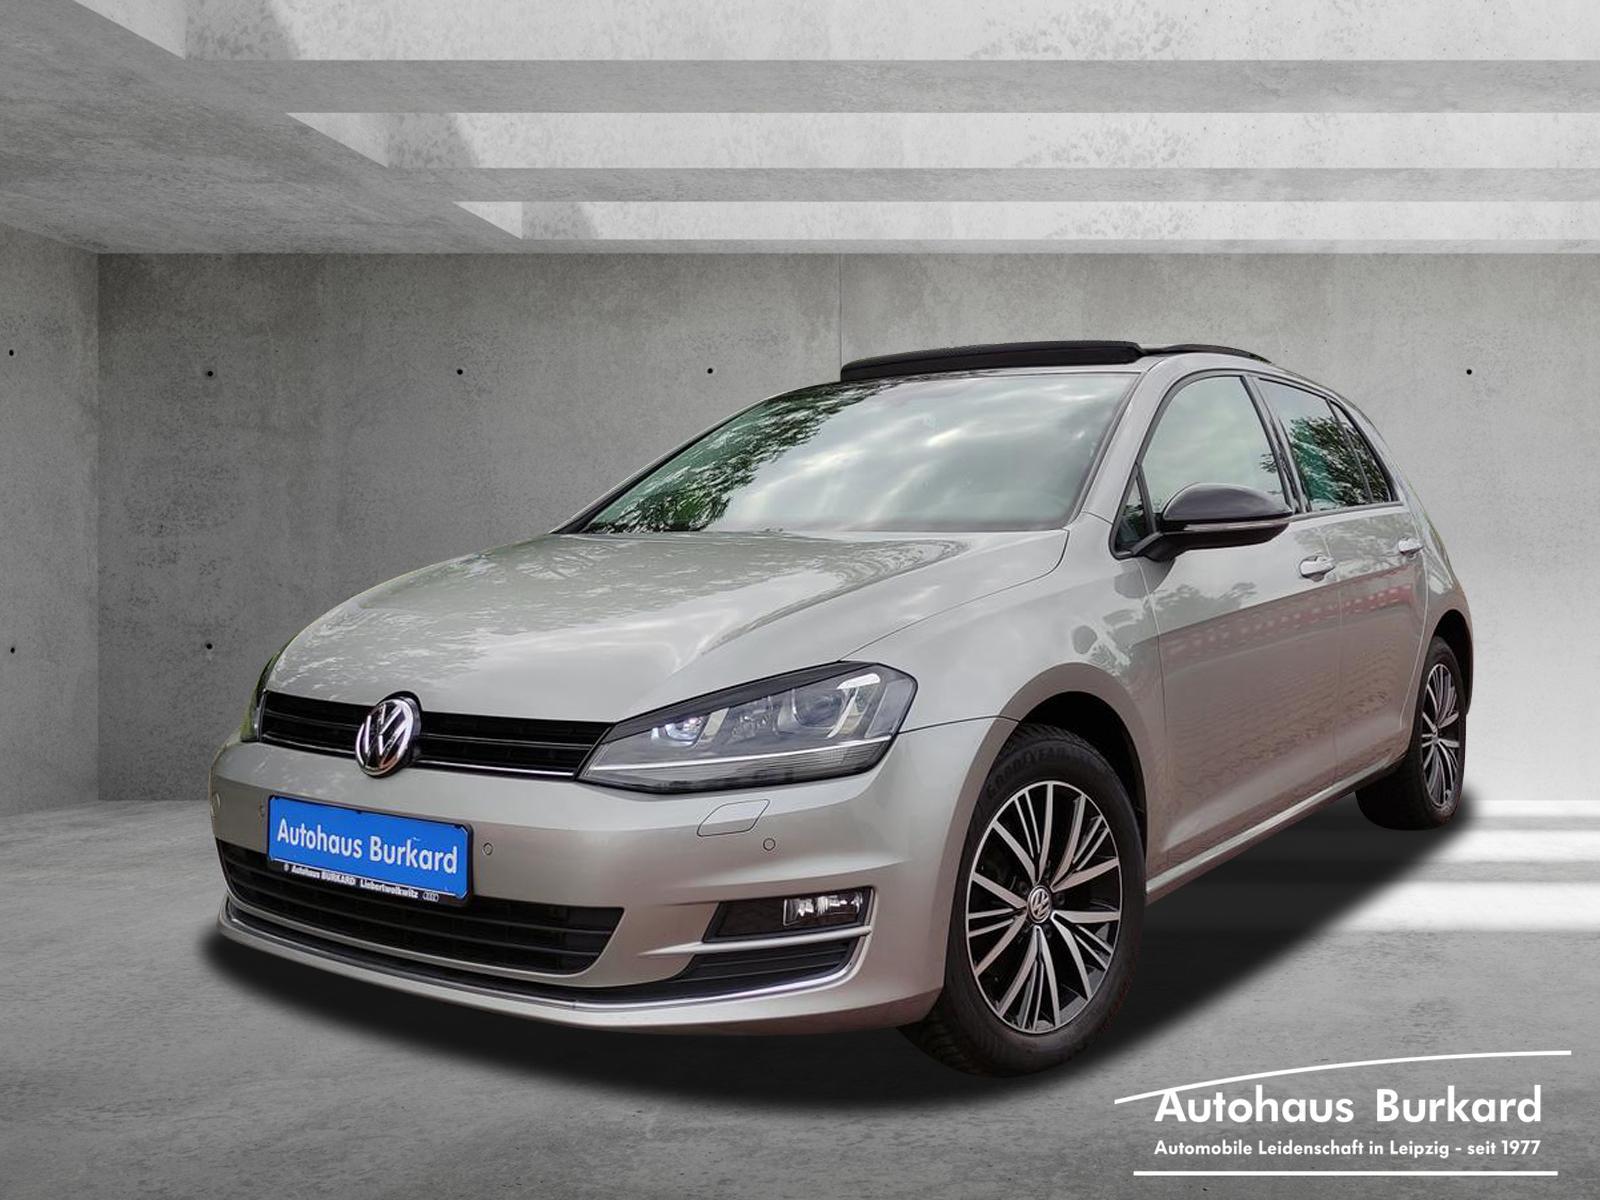 Volkswagen Golf Vll 2.0 TDI Allstar DSG, Dynaudio, Park Assist, Jahr 2016, Diesel